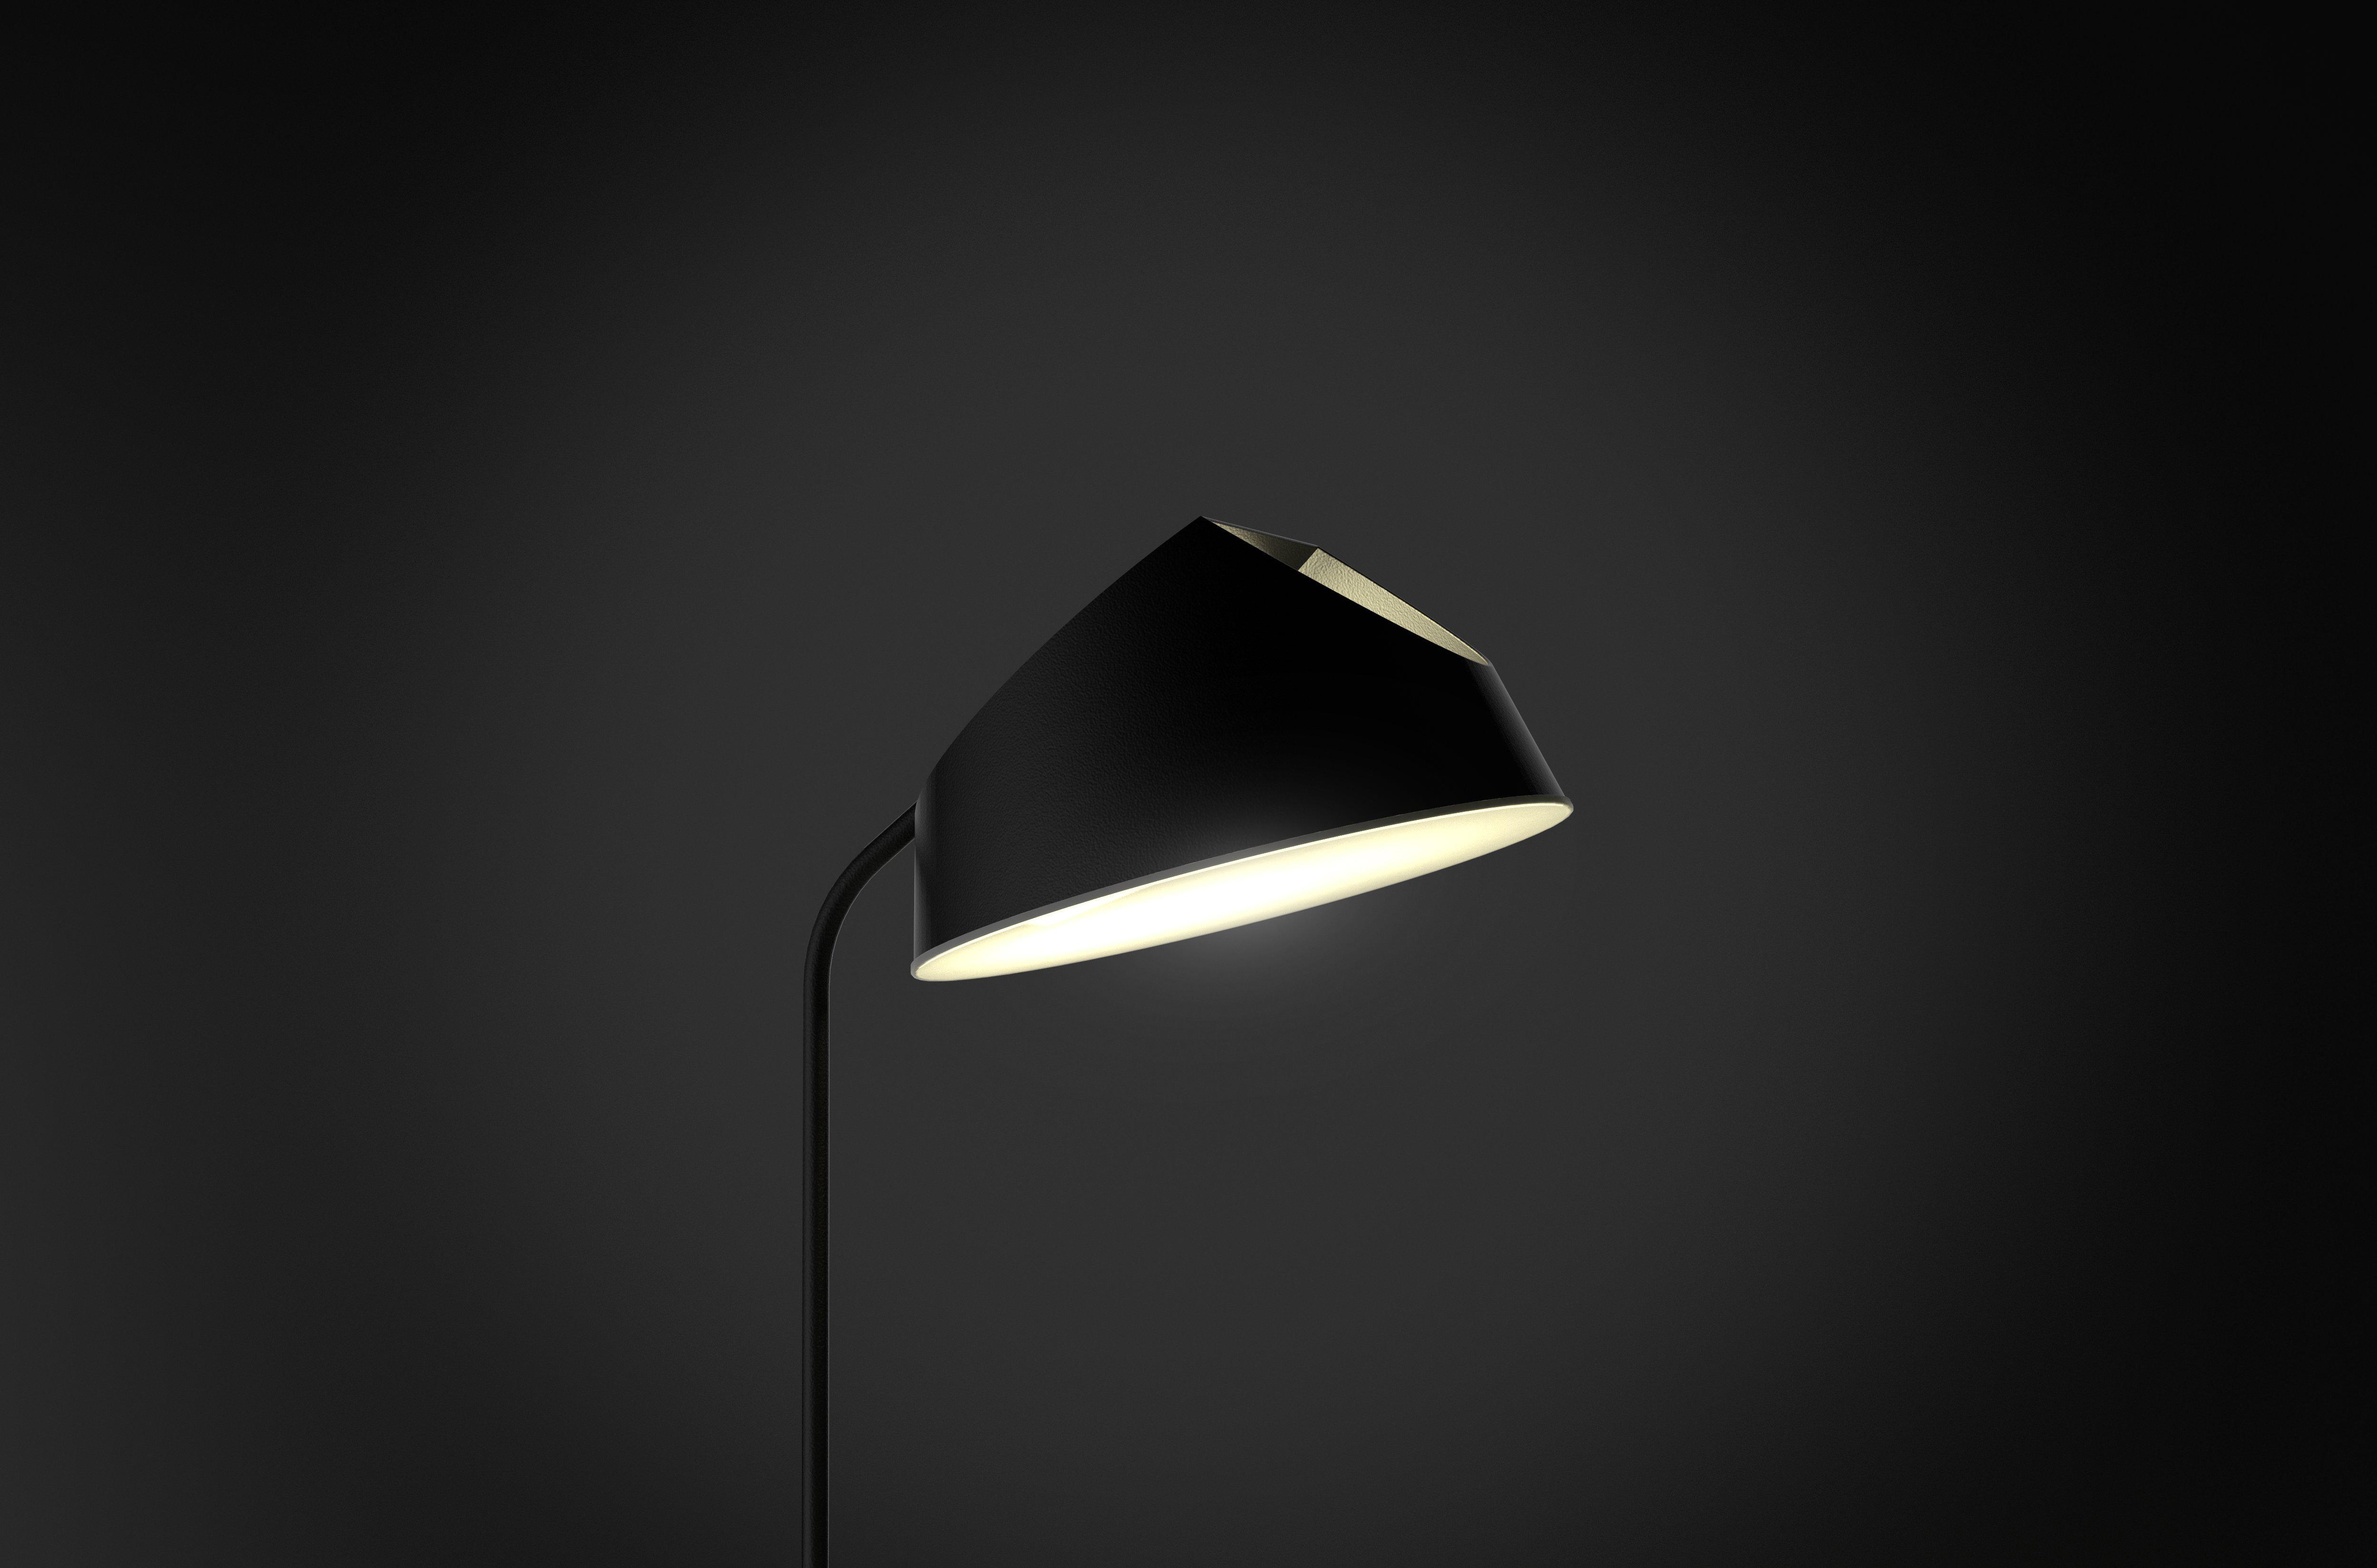 Minimalista lampara diseño detalle negro